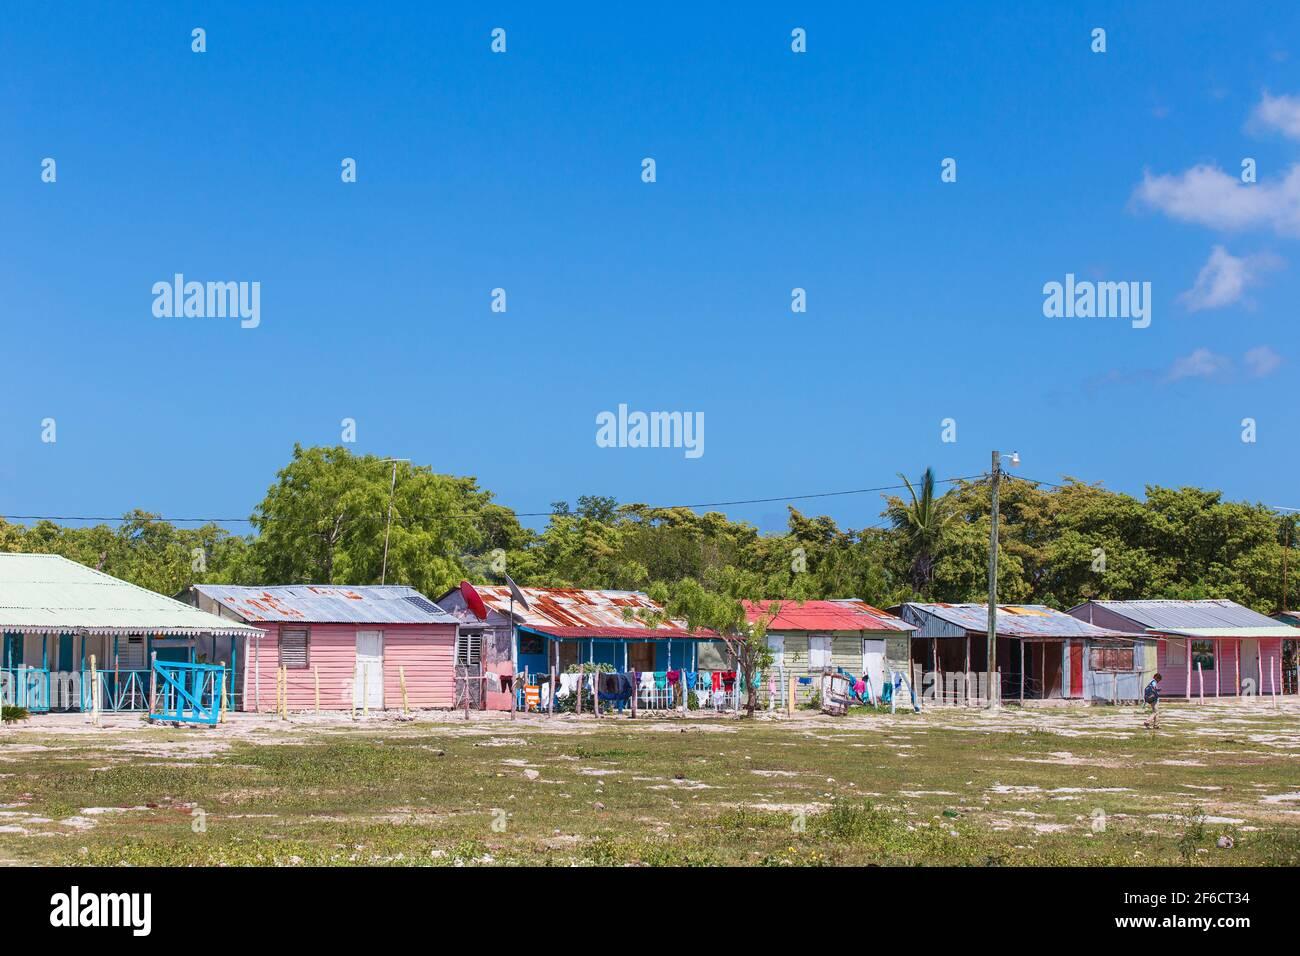 Dominican Republic, Punta Cana, Parque Nacional del Este, Saona Island, Mano Juan, a picturesque fishing village Stock Photo